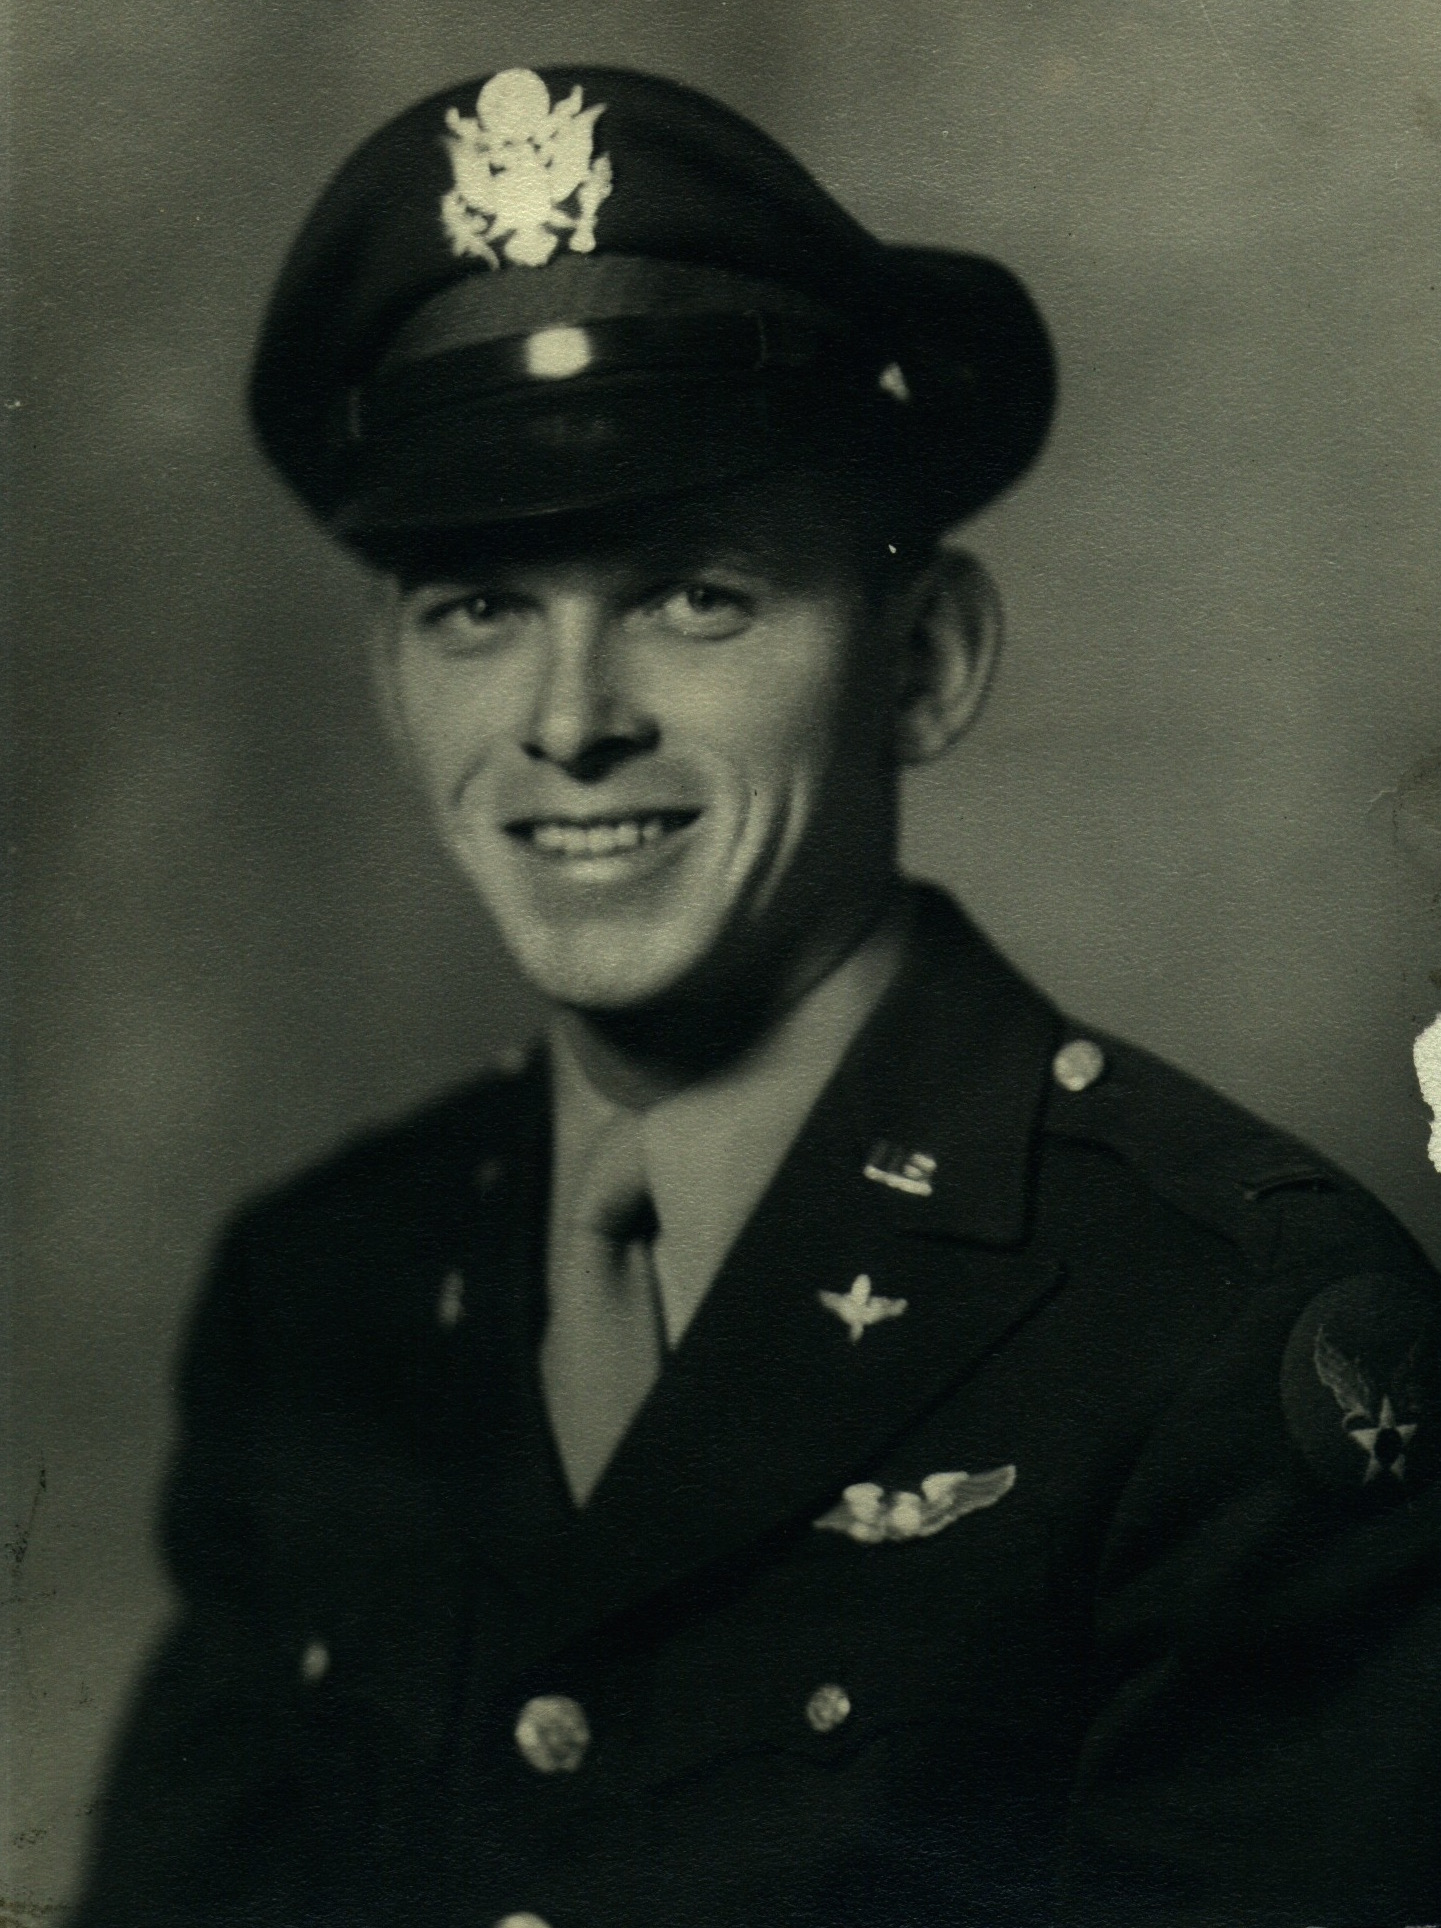 Air Force Pilot George Kyle